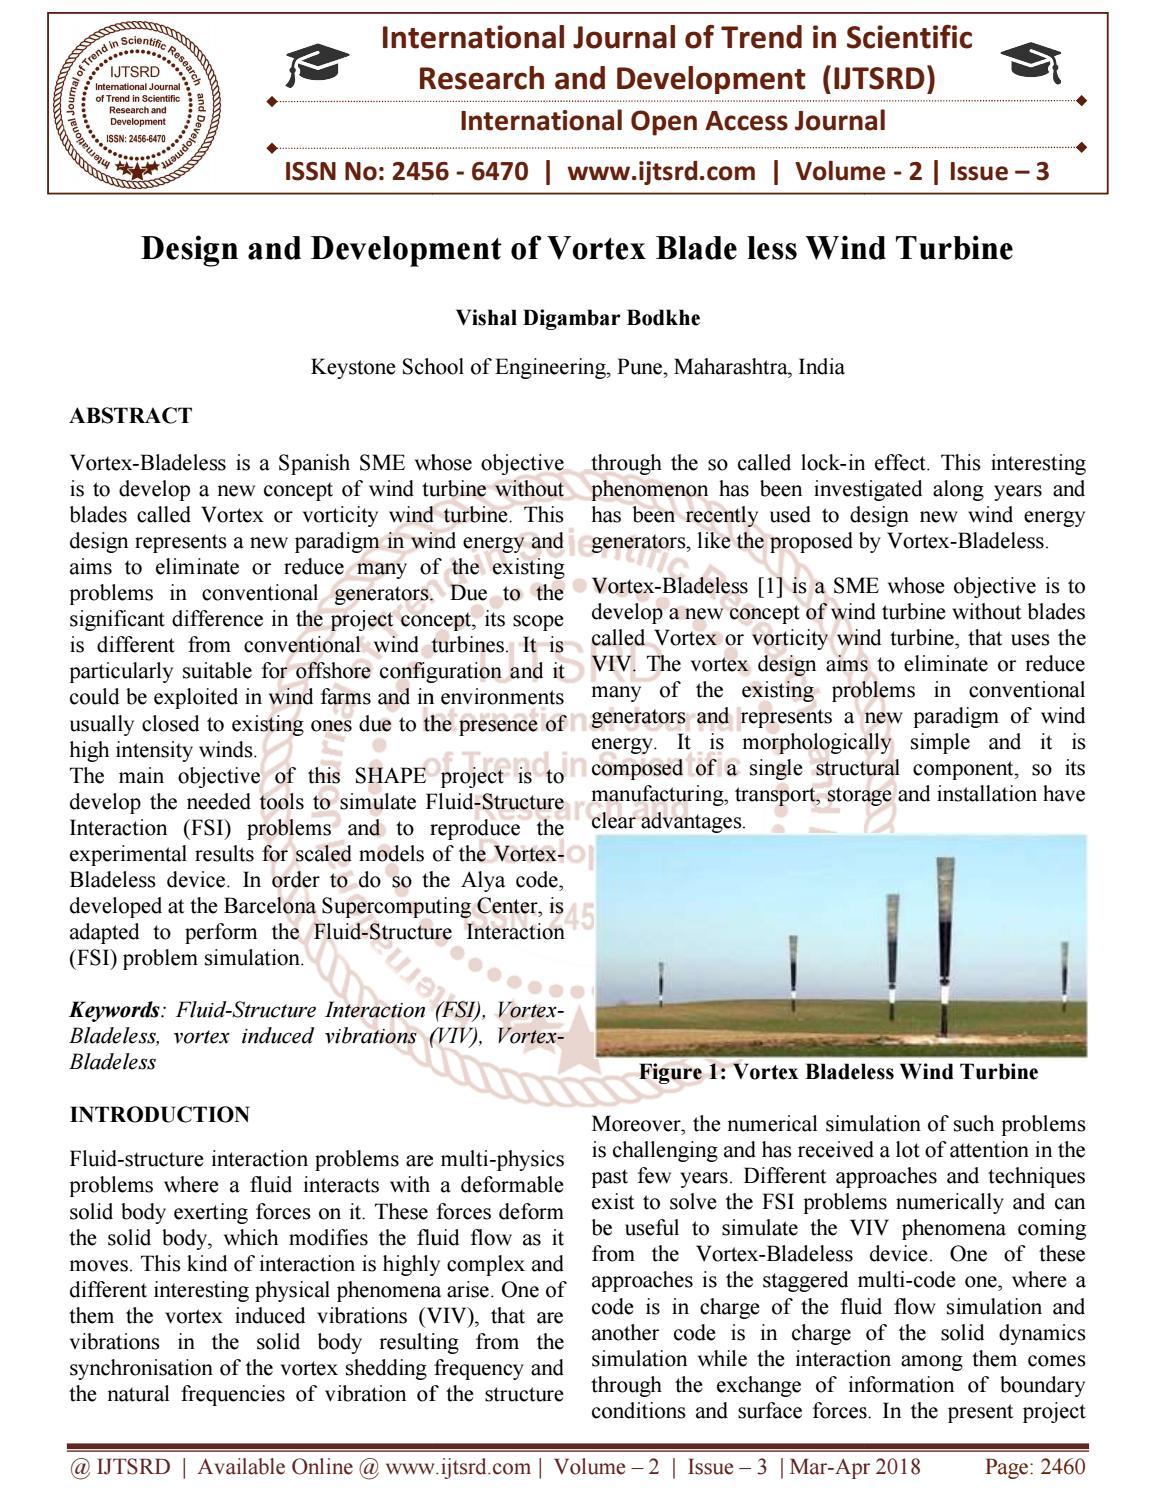 Design and Development of Vortex Blade less Wind Turbine by